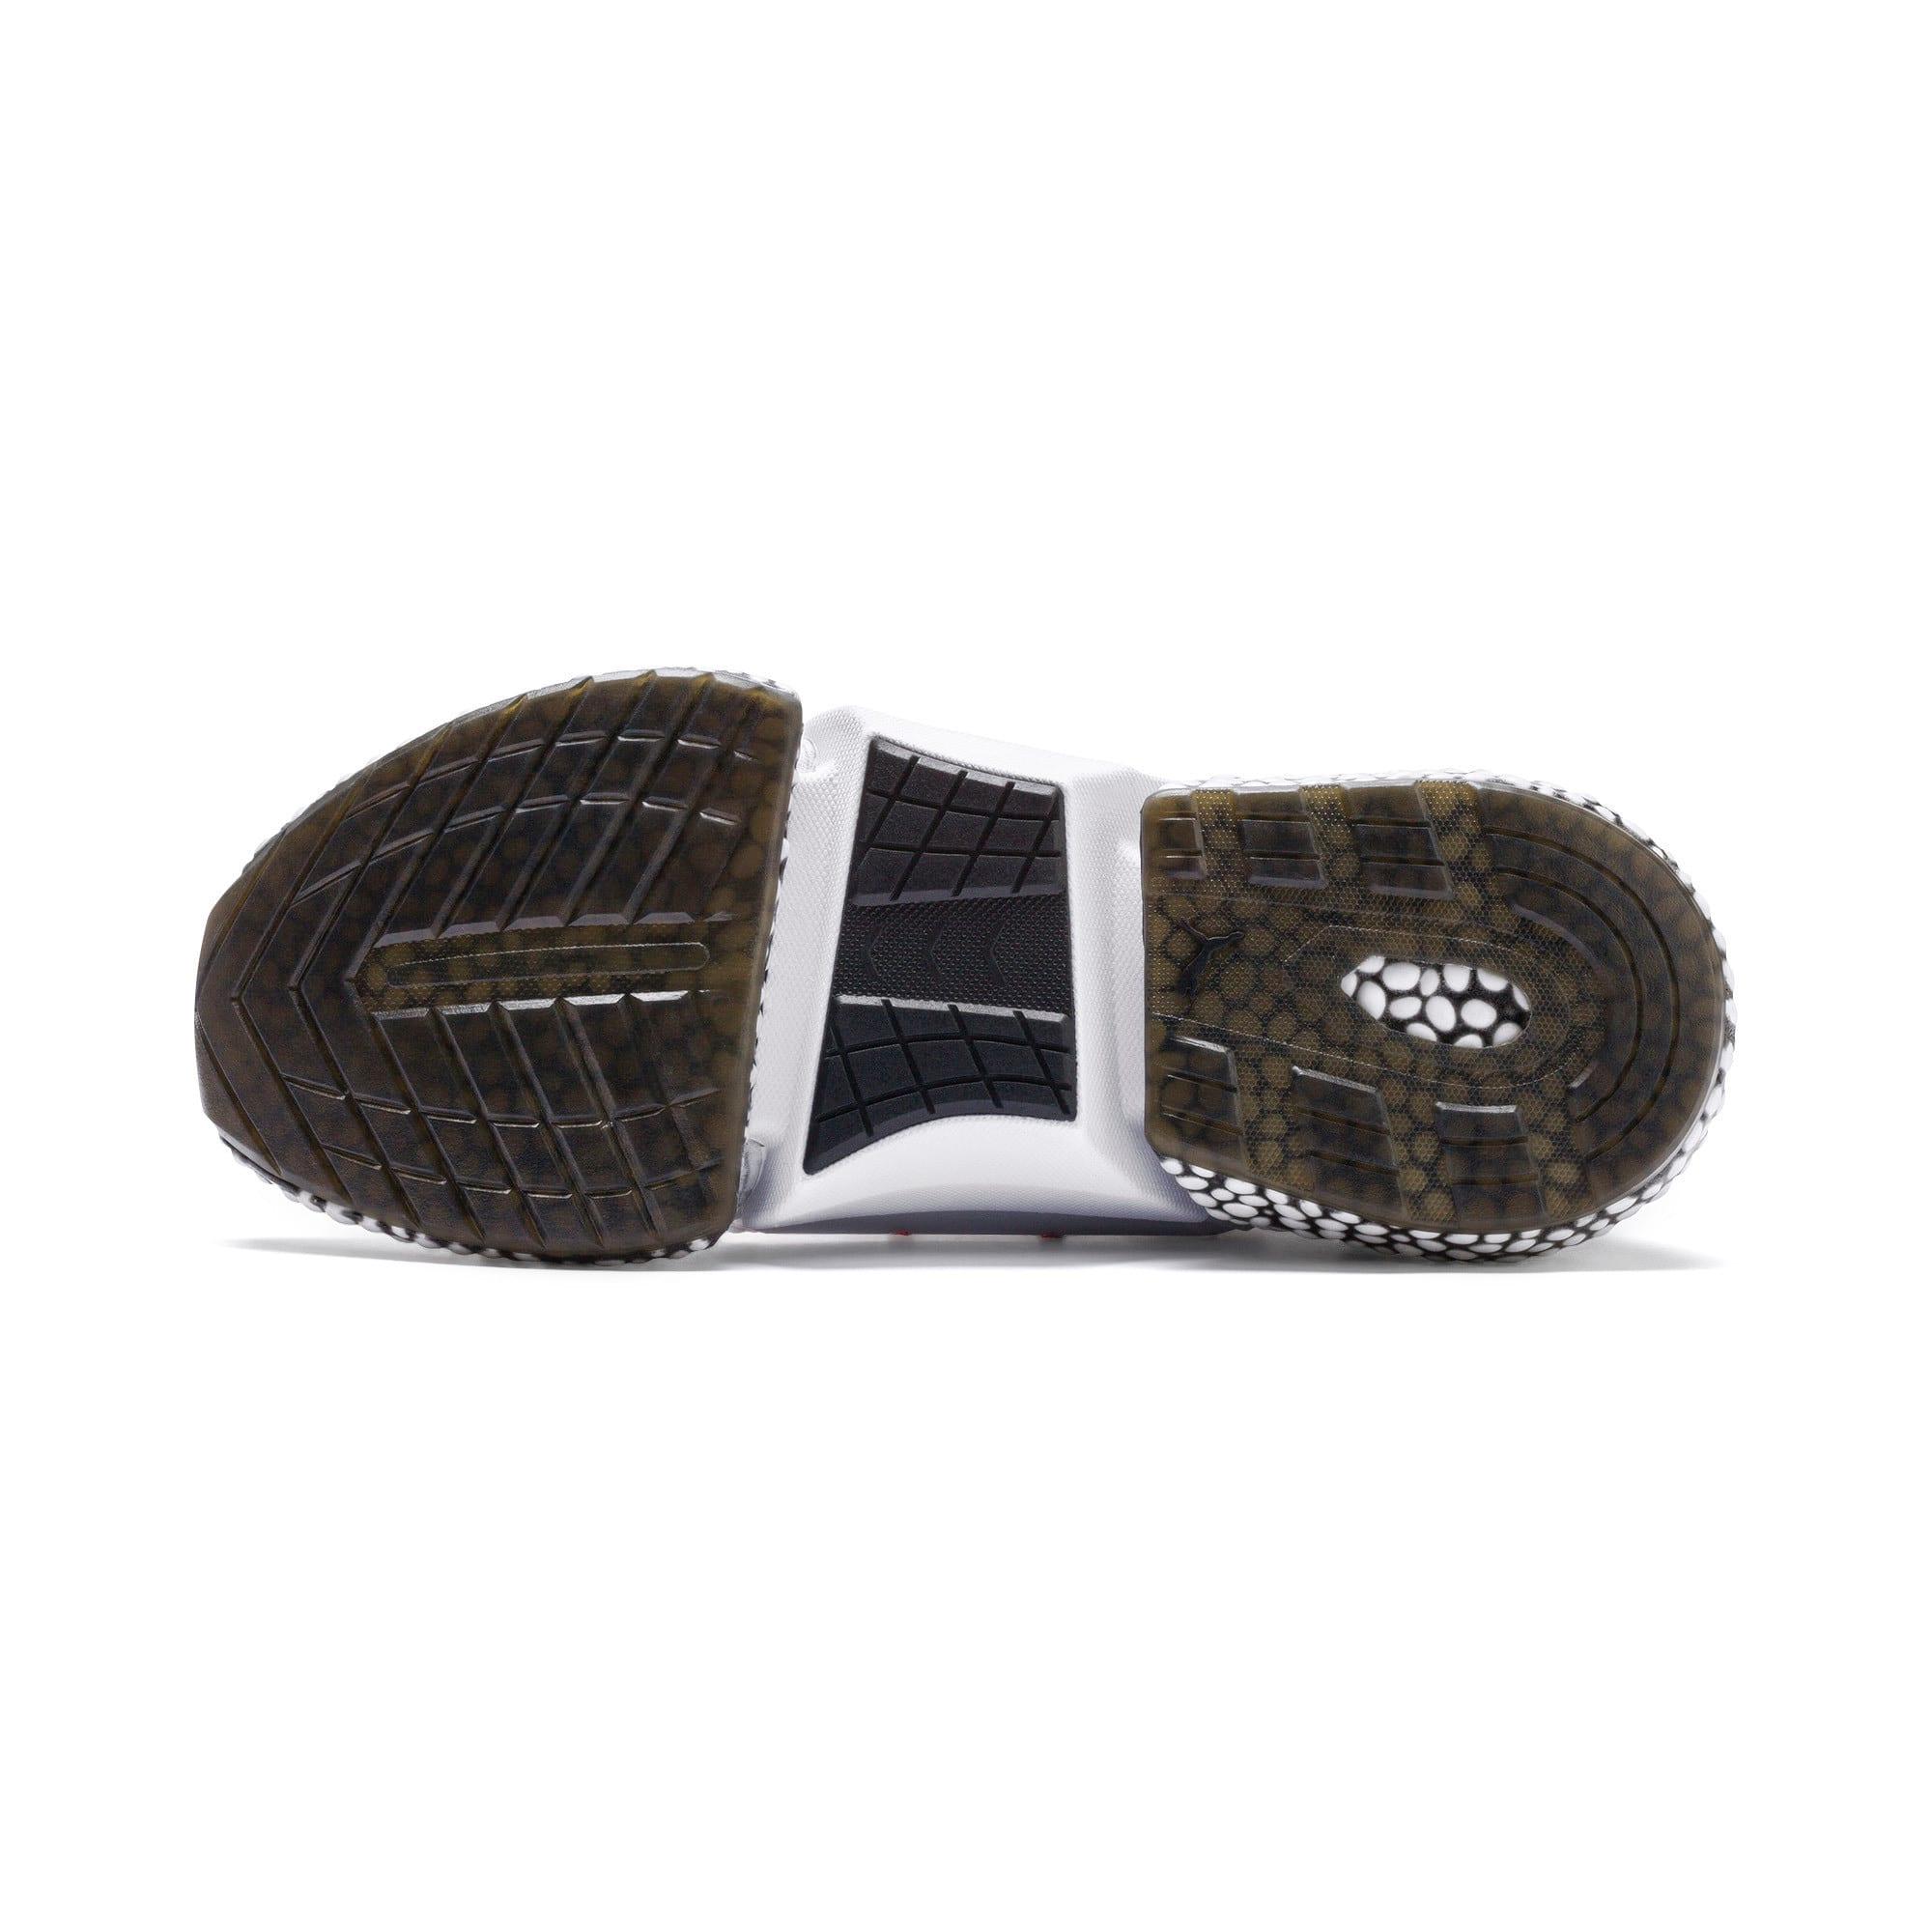 Thumbnail 5 of HYBRID Rocket Aero Men's Running Shoes, Puma White-Puma Black, medium